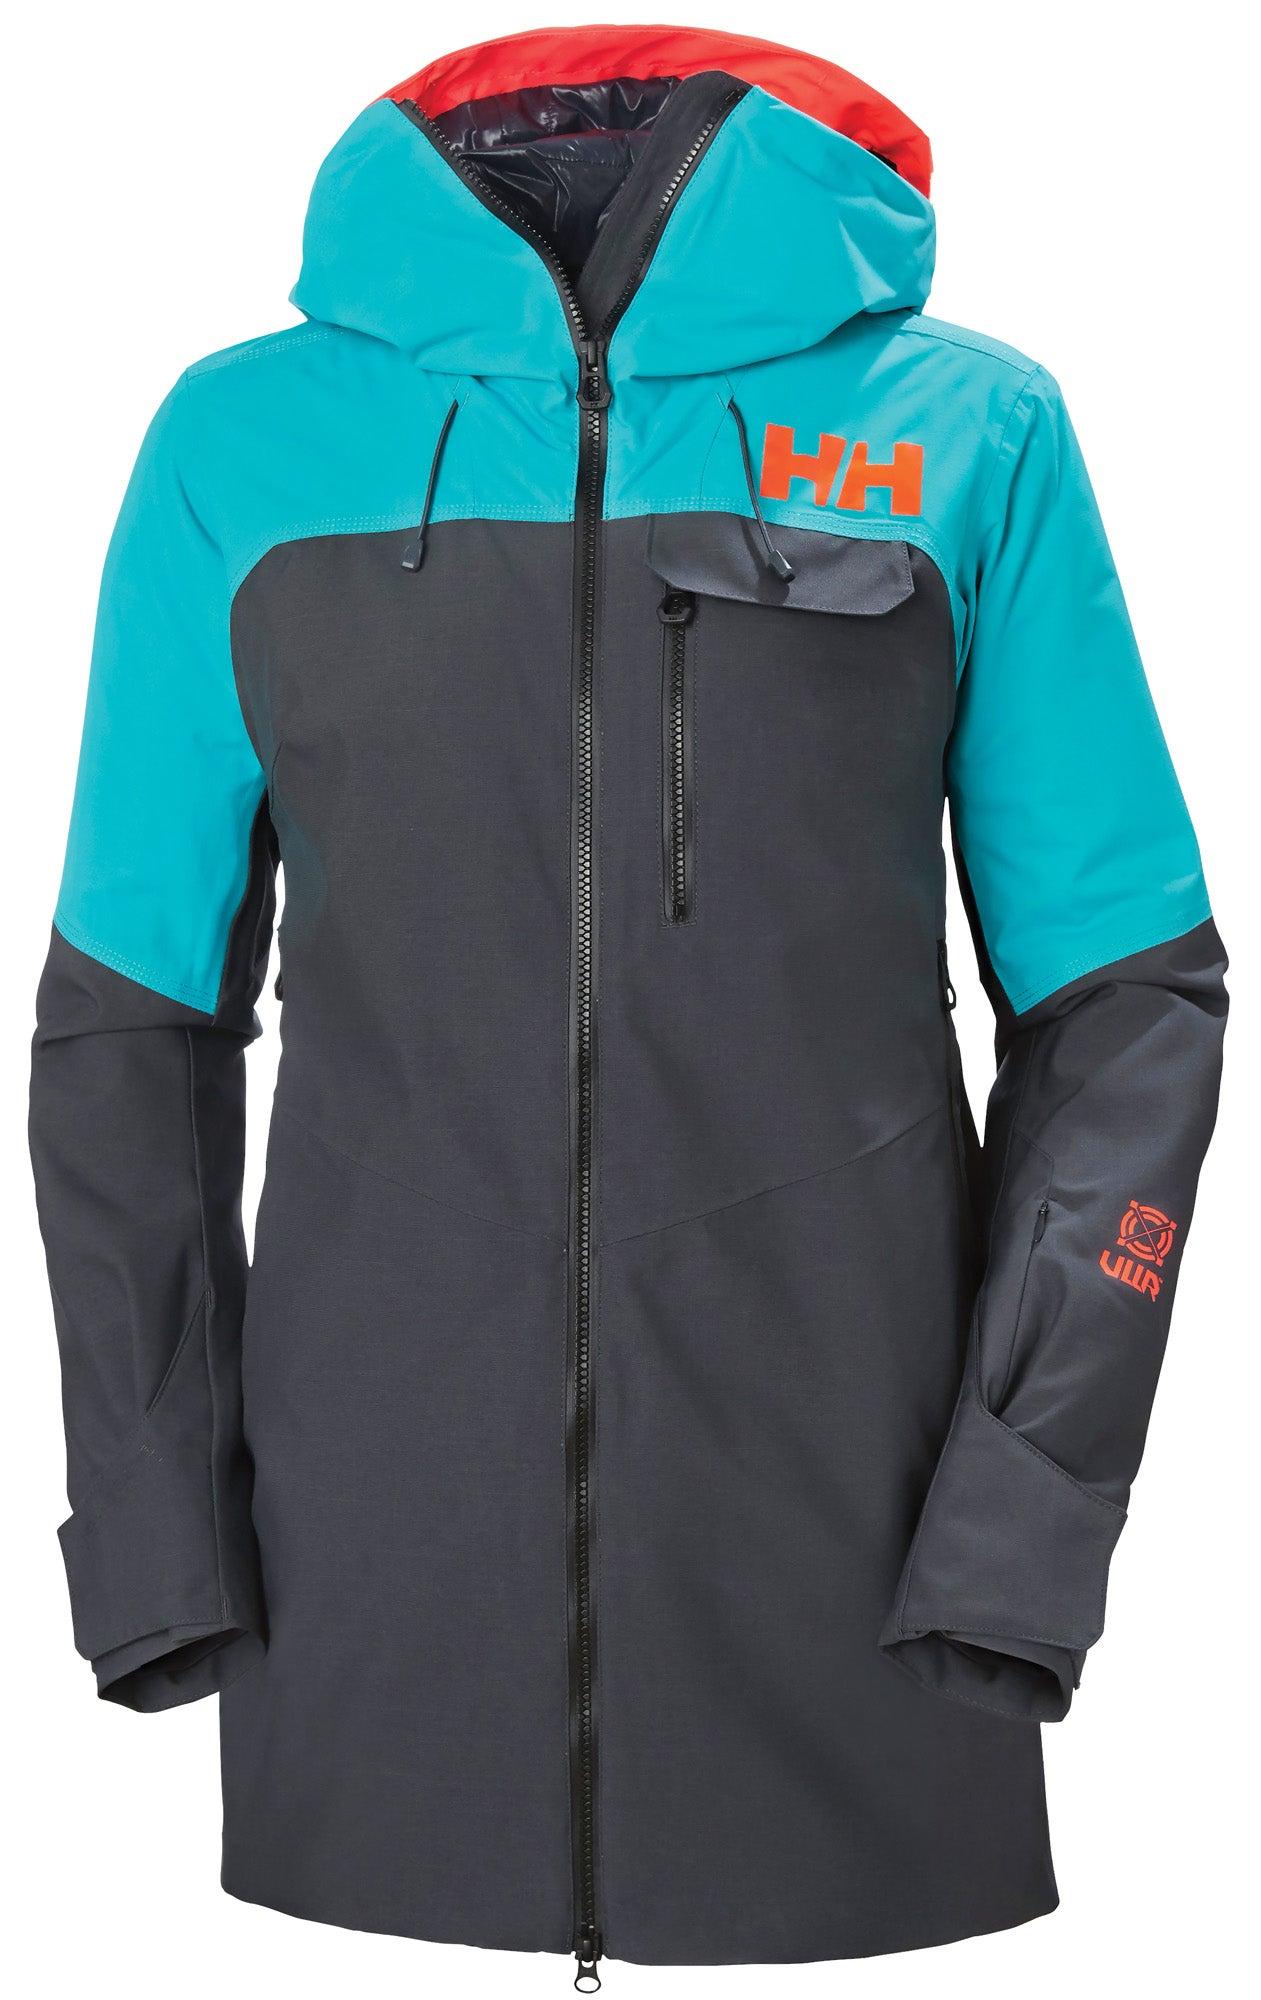 Helly Hansen Whitewall lifaloft Women's Ski Jacket